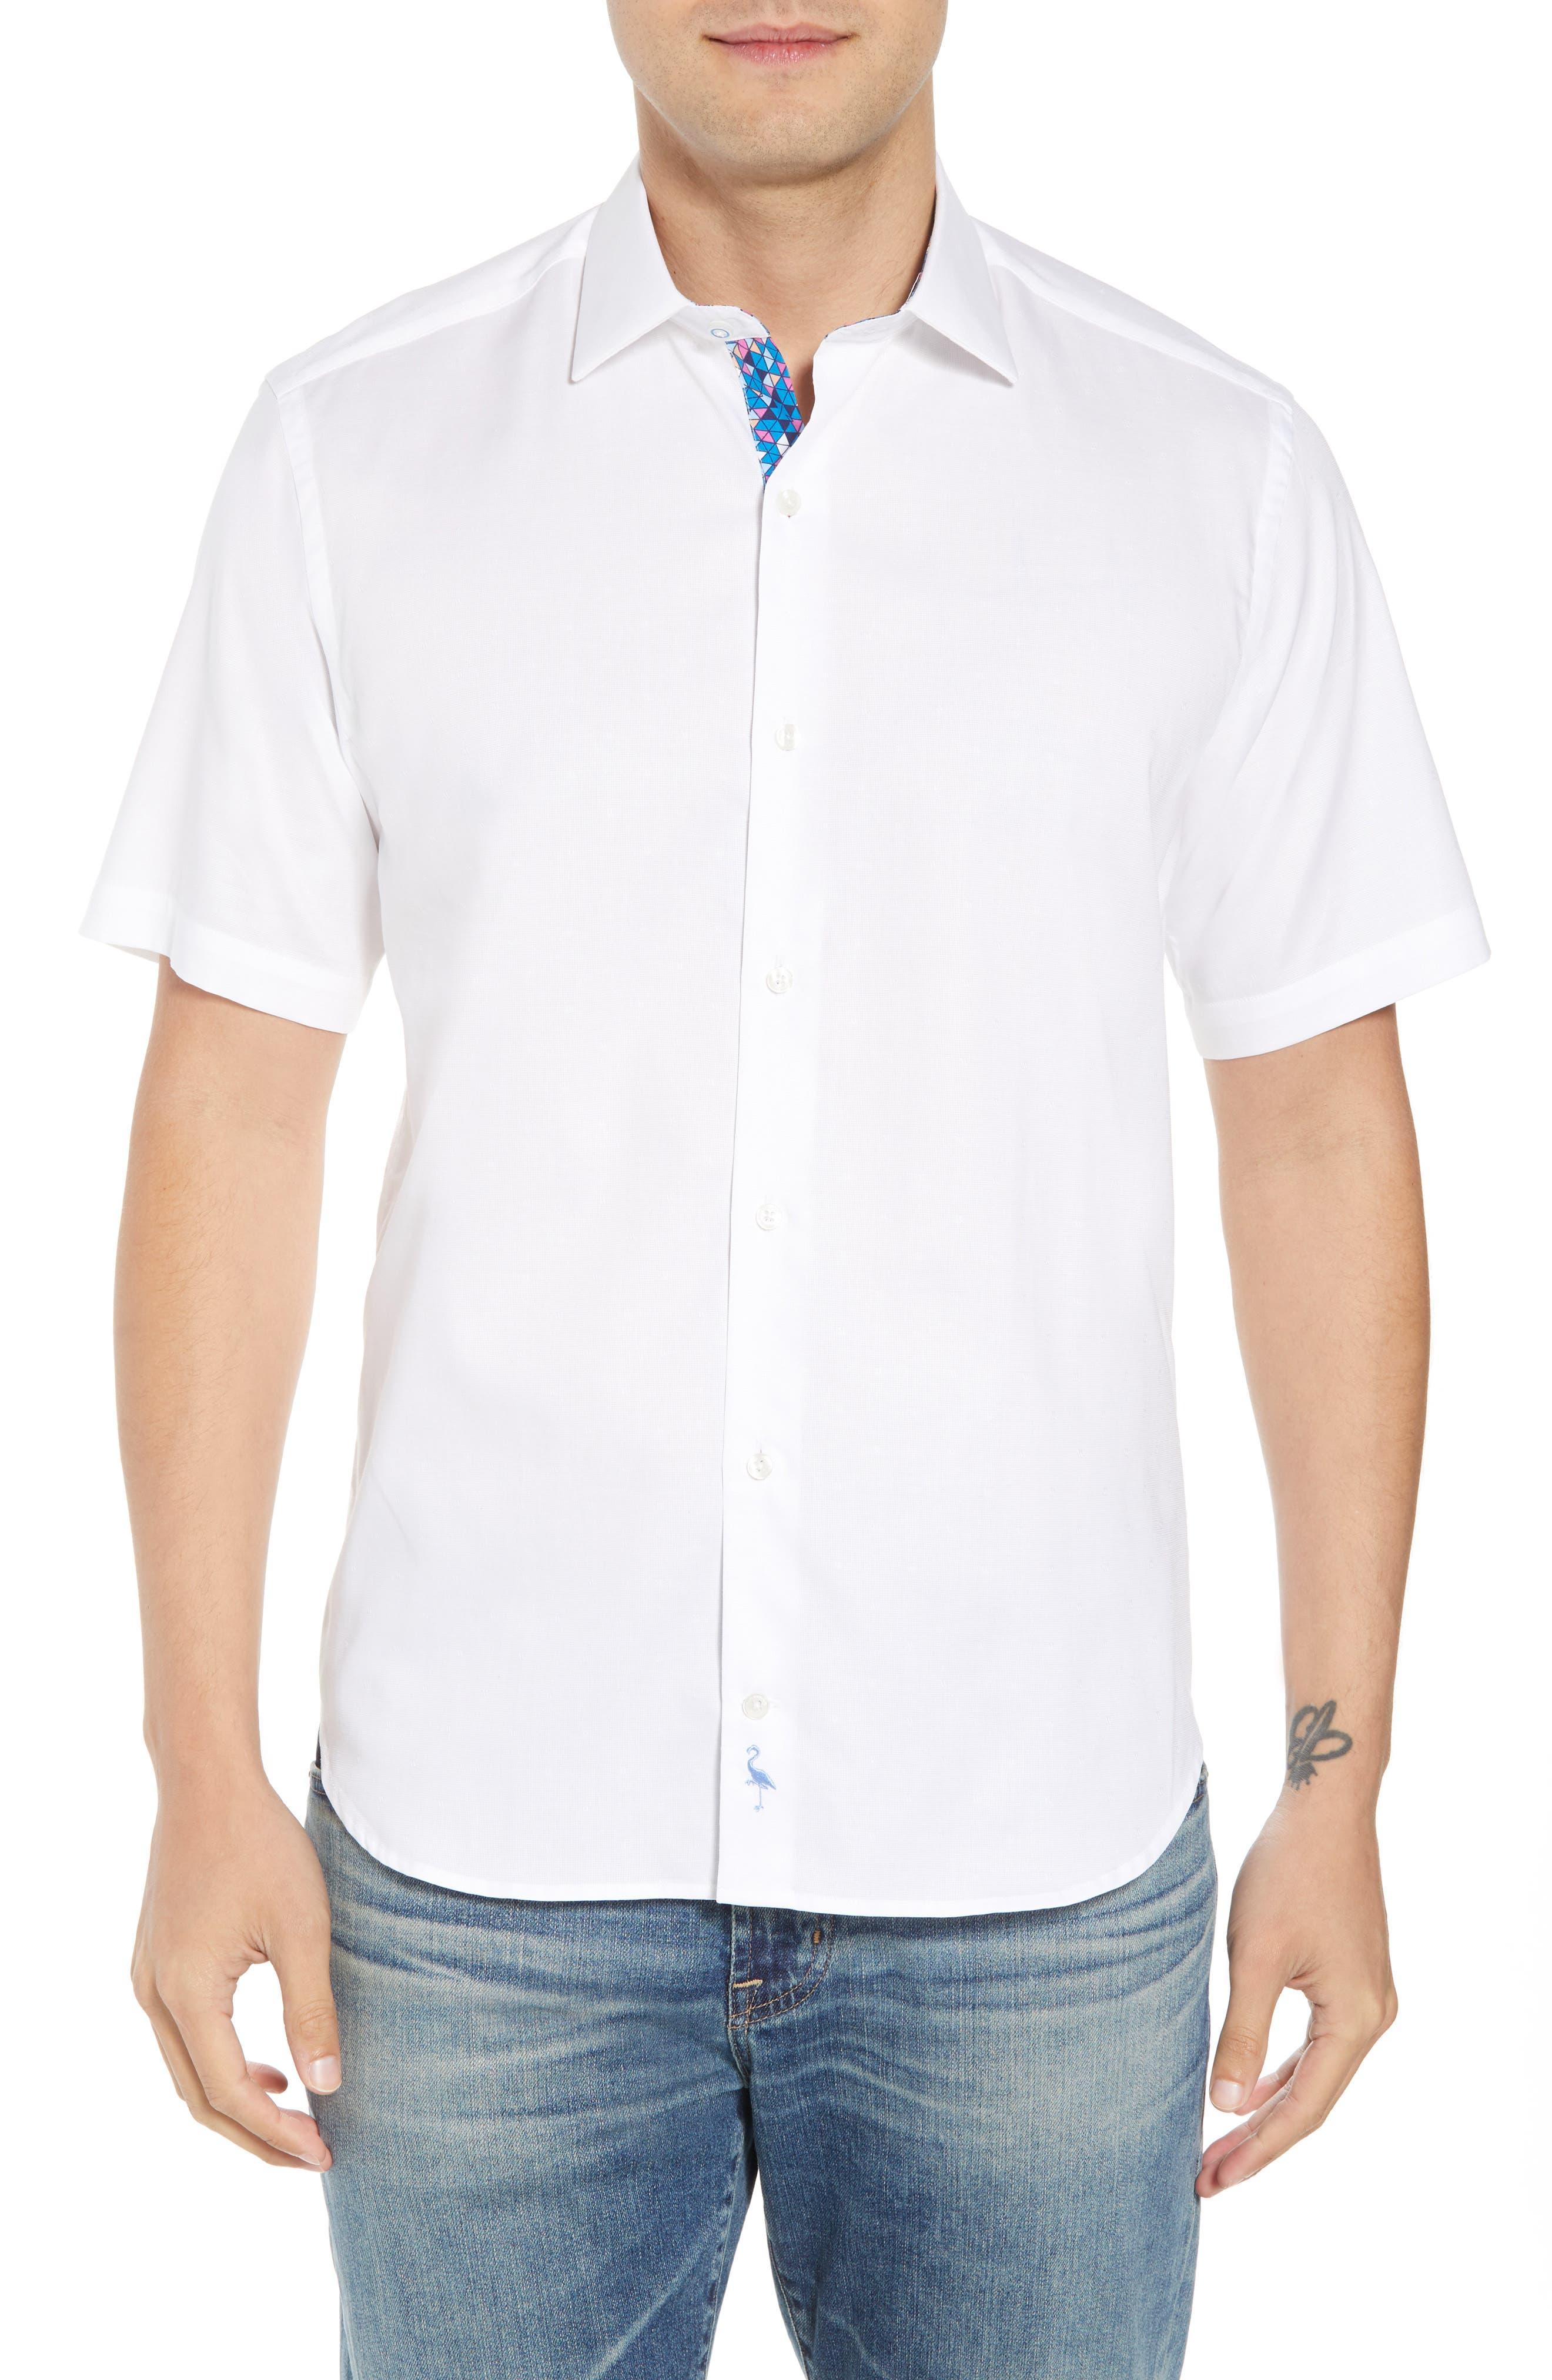 Arlen Regular Fit Sport Shirt,                             Main thumbnail 1, color,